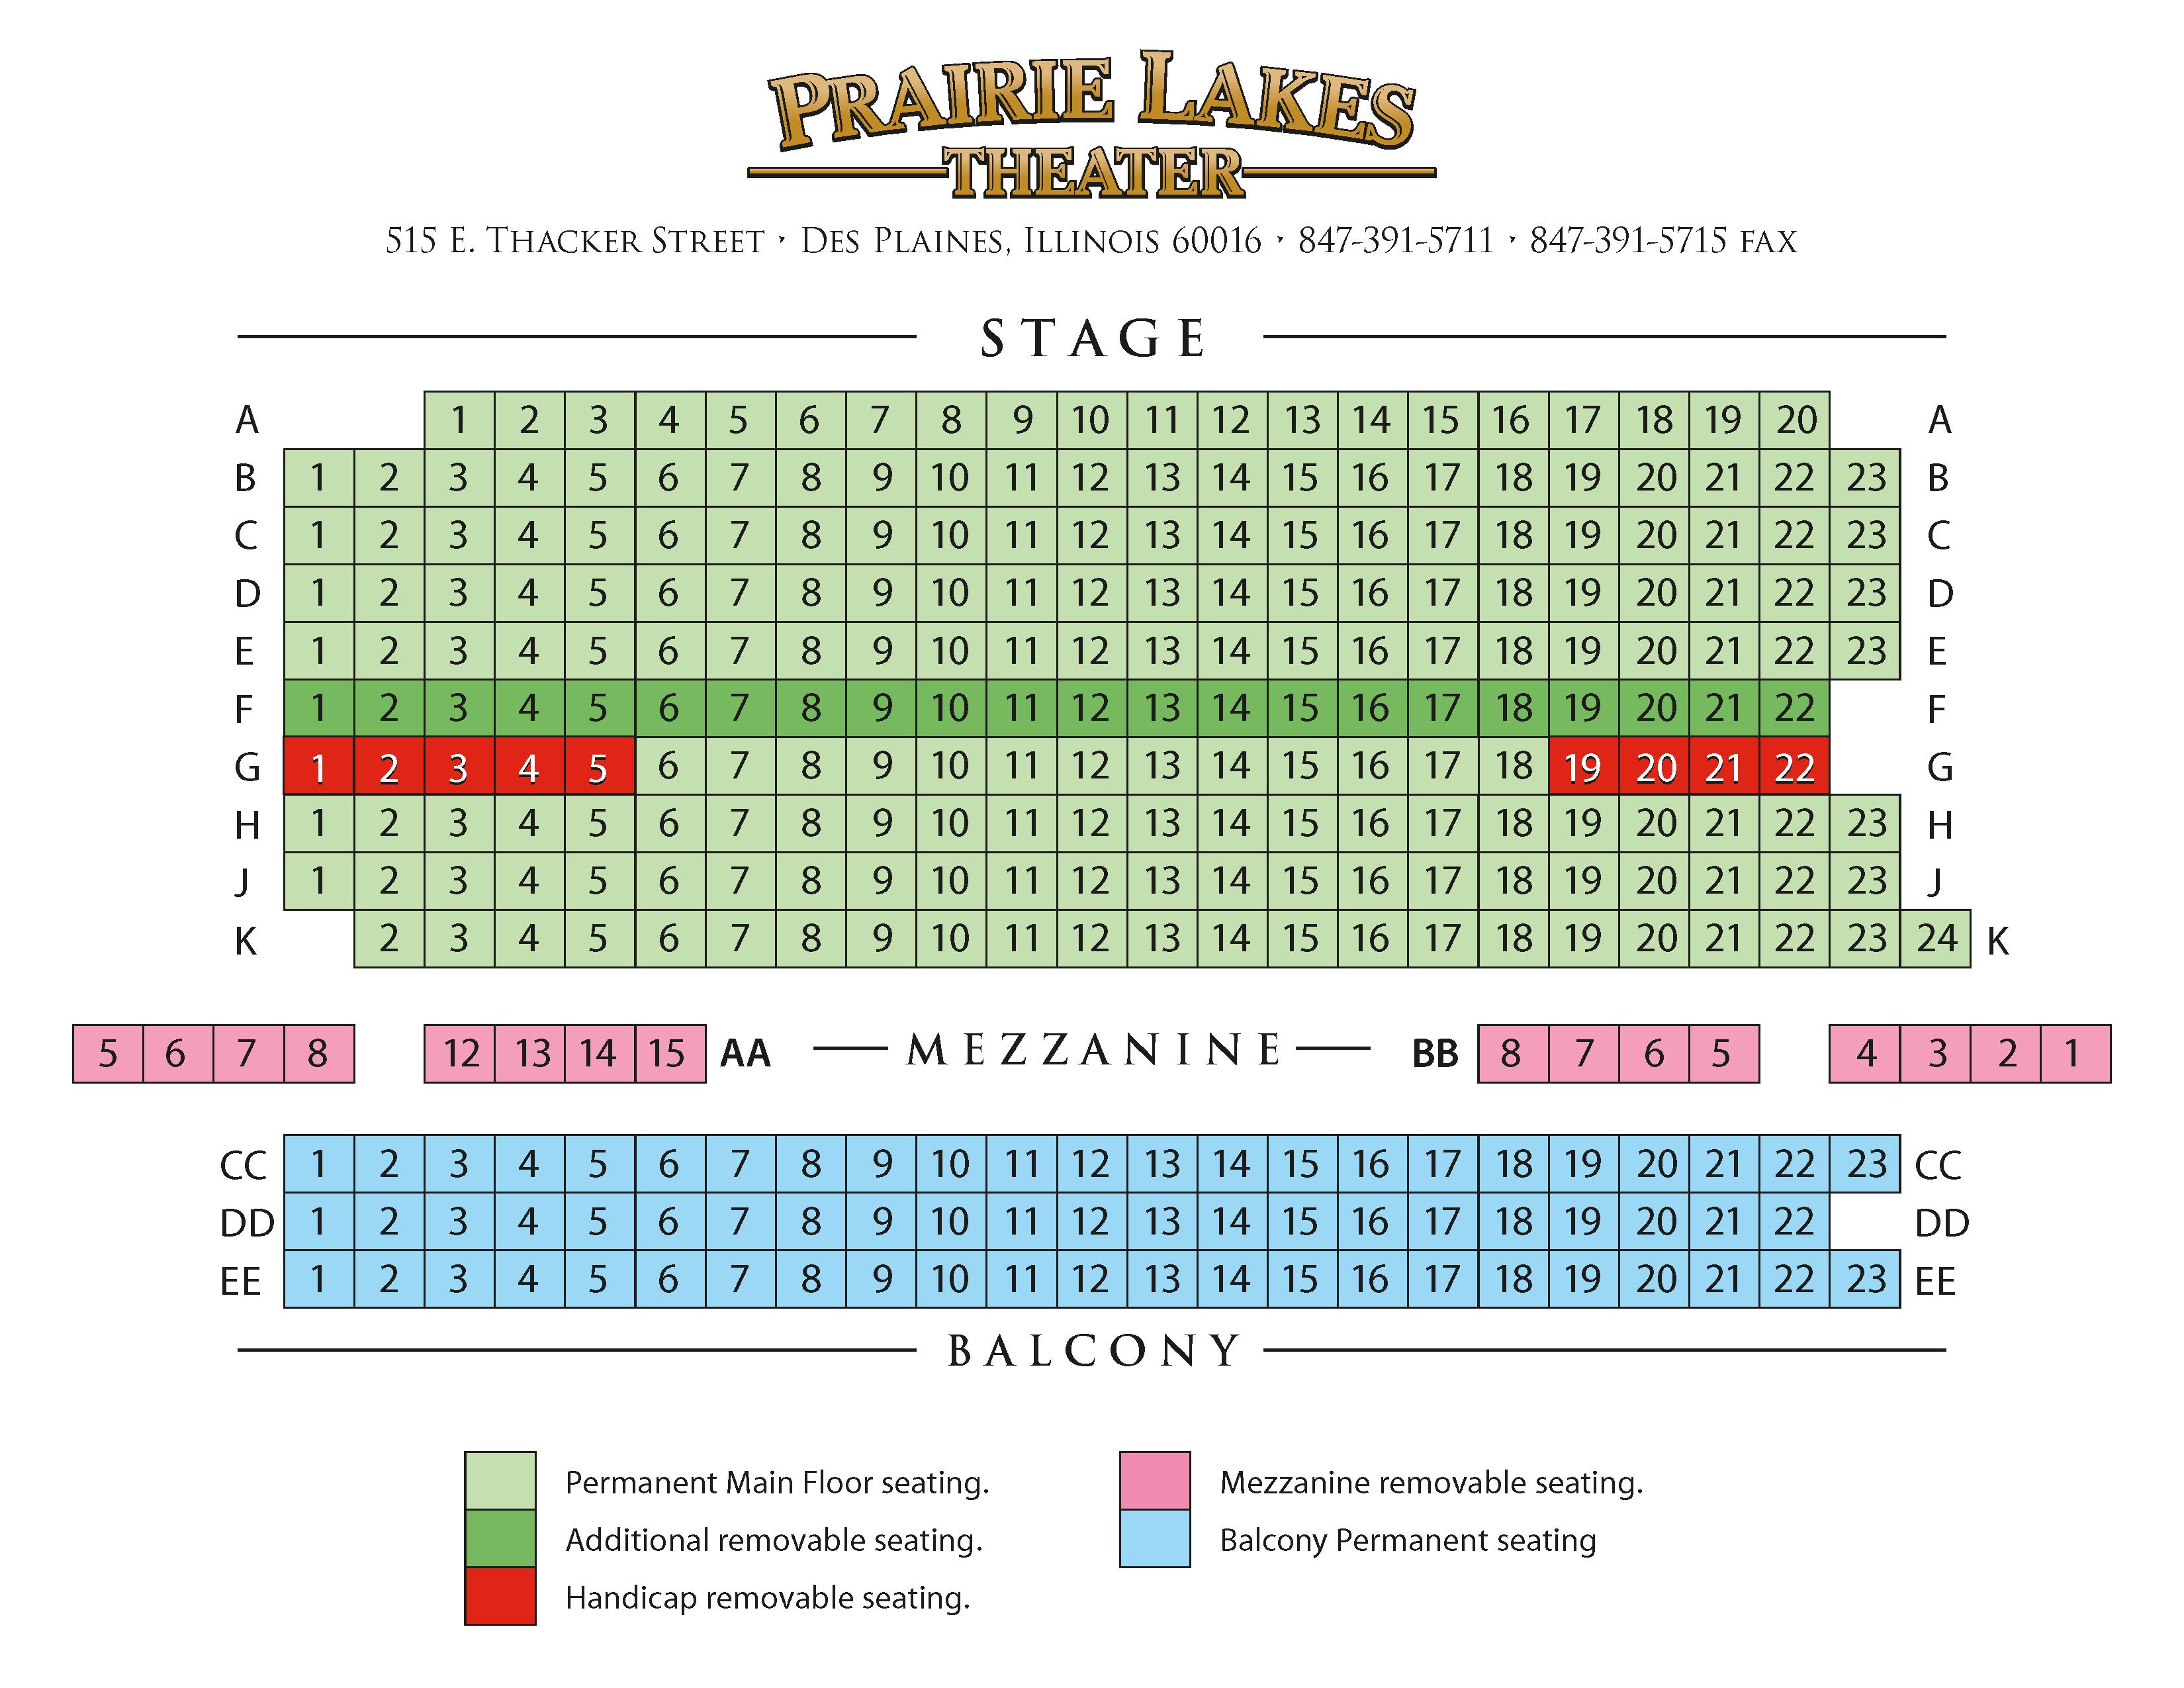 Prairie Lakes Theater Seating Chart